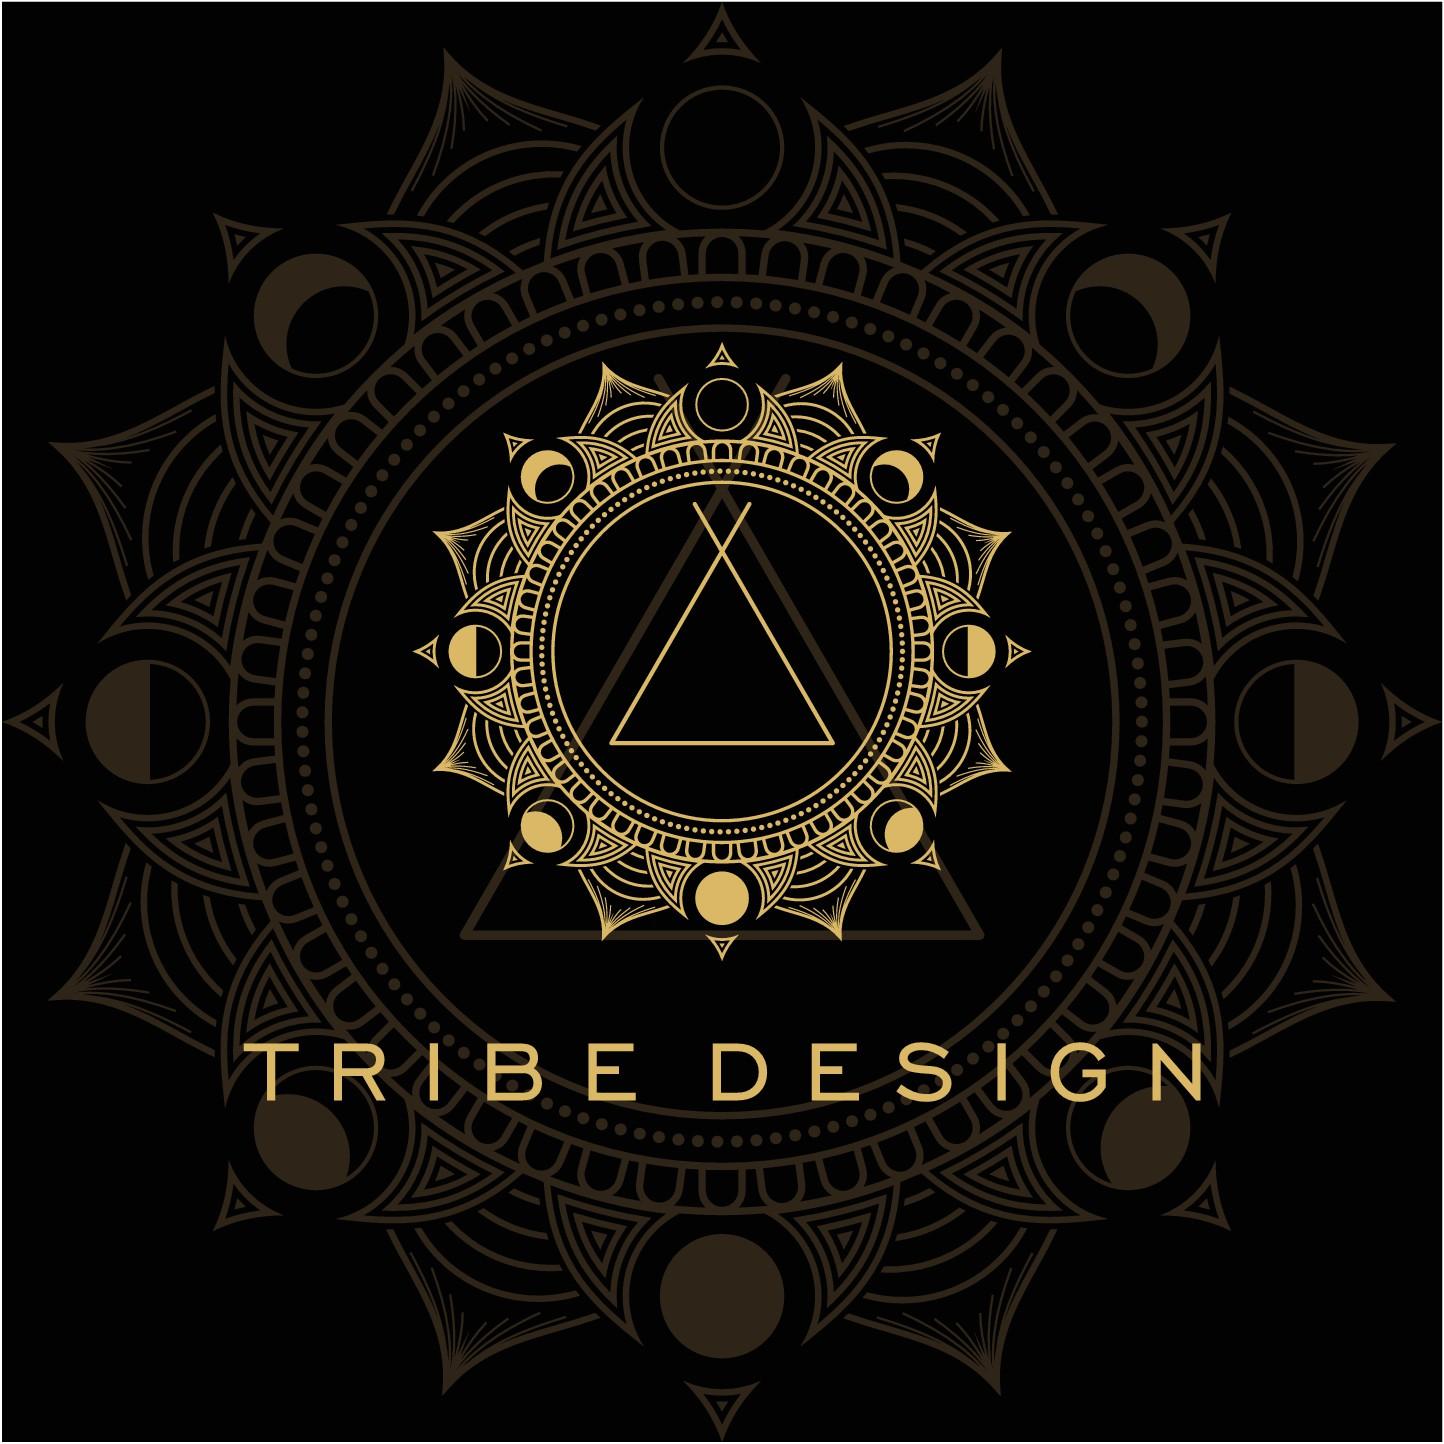 Create a Mystical & Timeless Logo for International Tribe Design